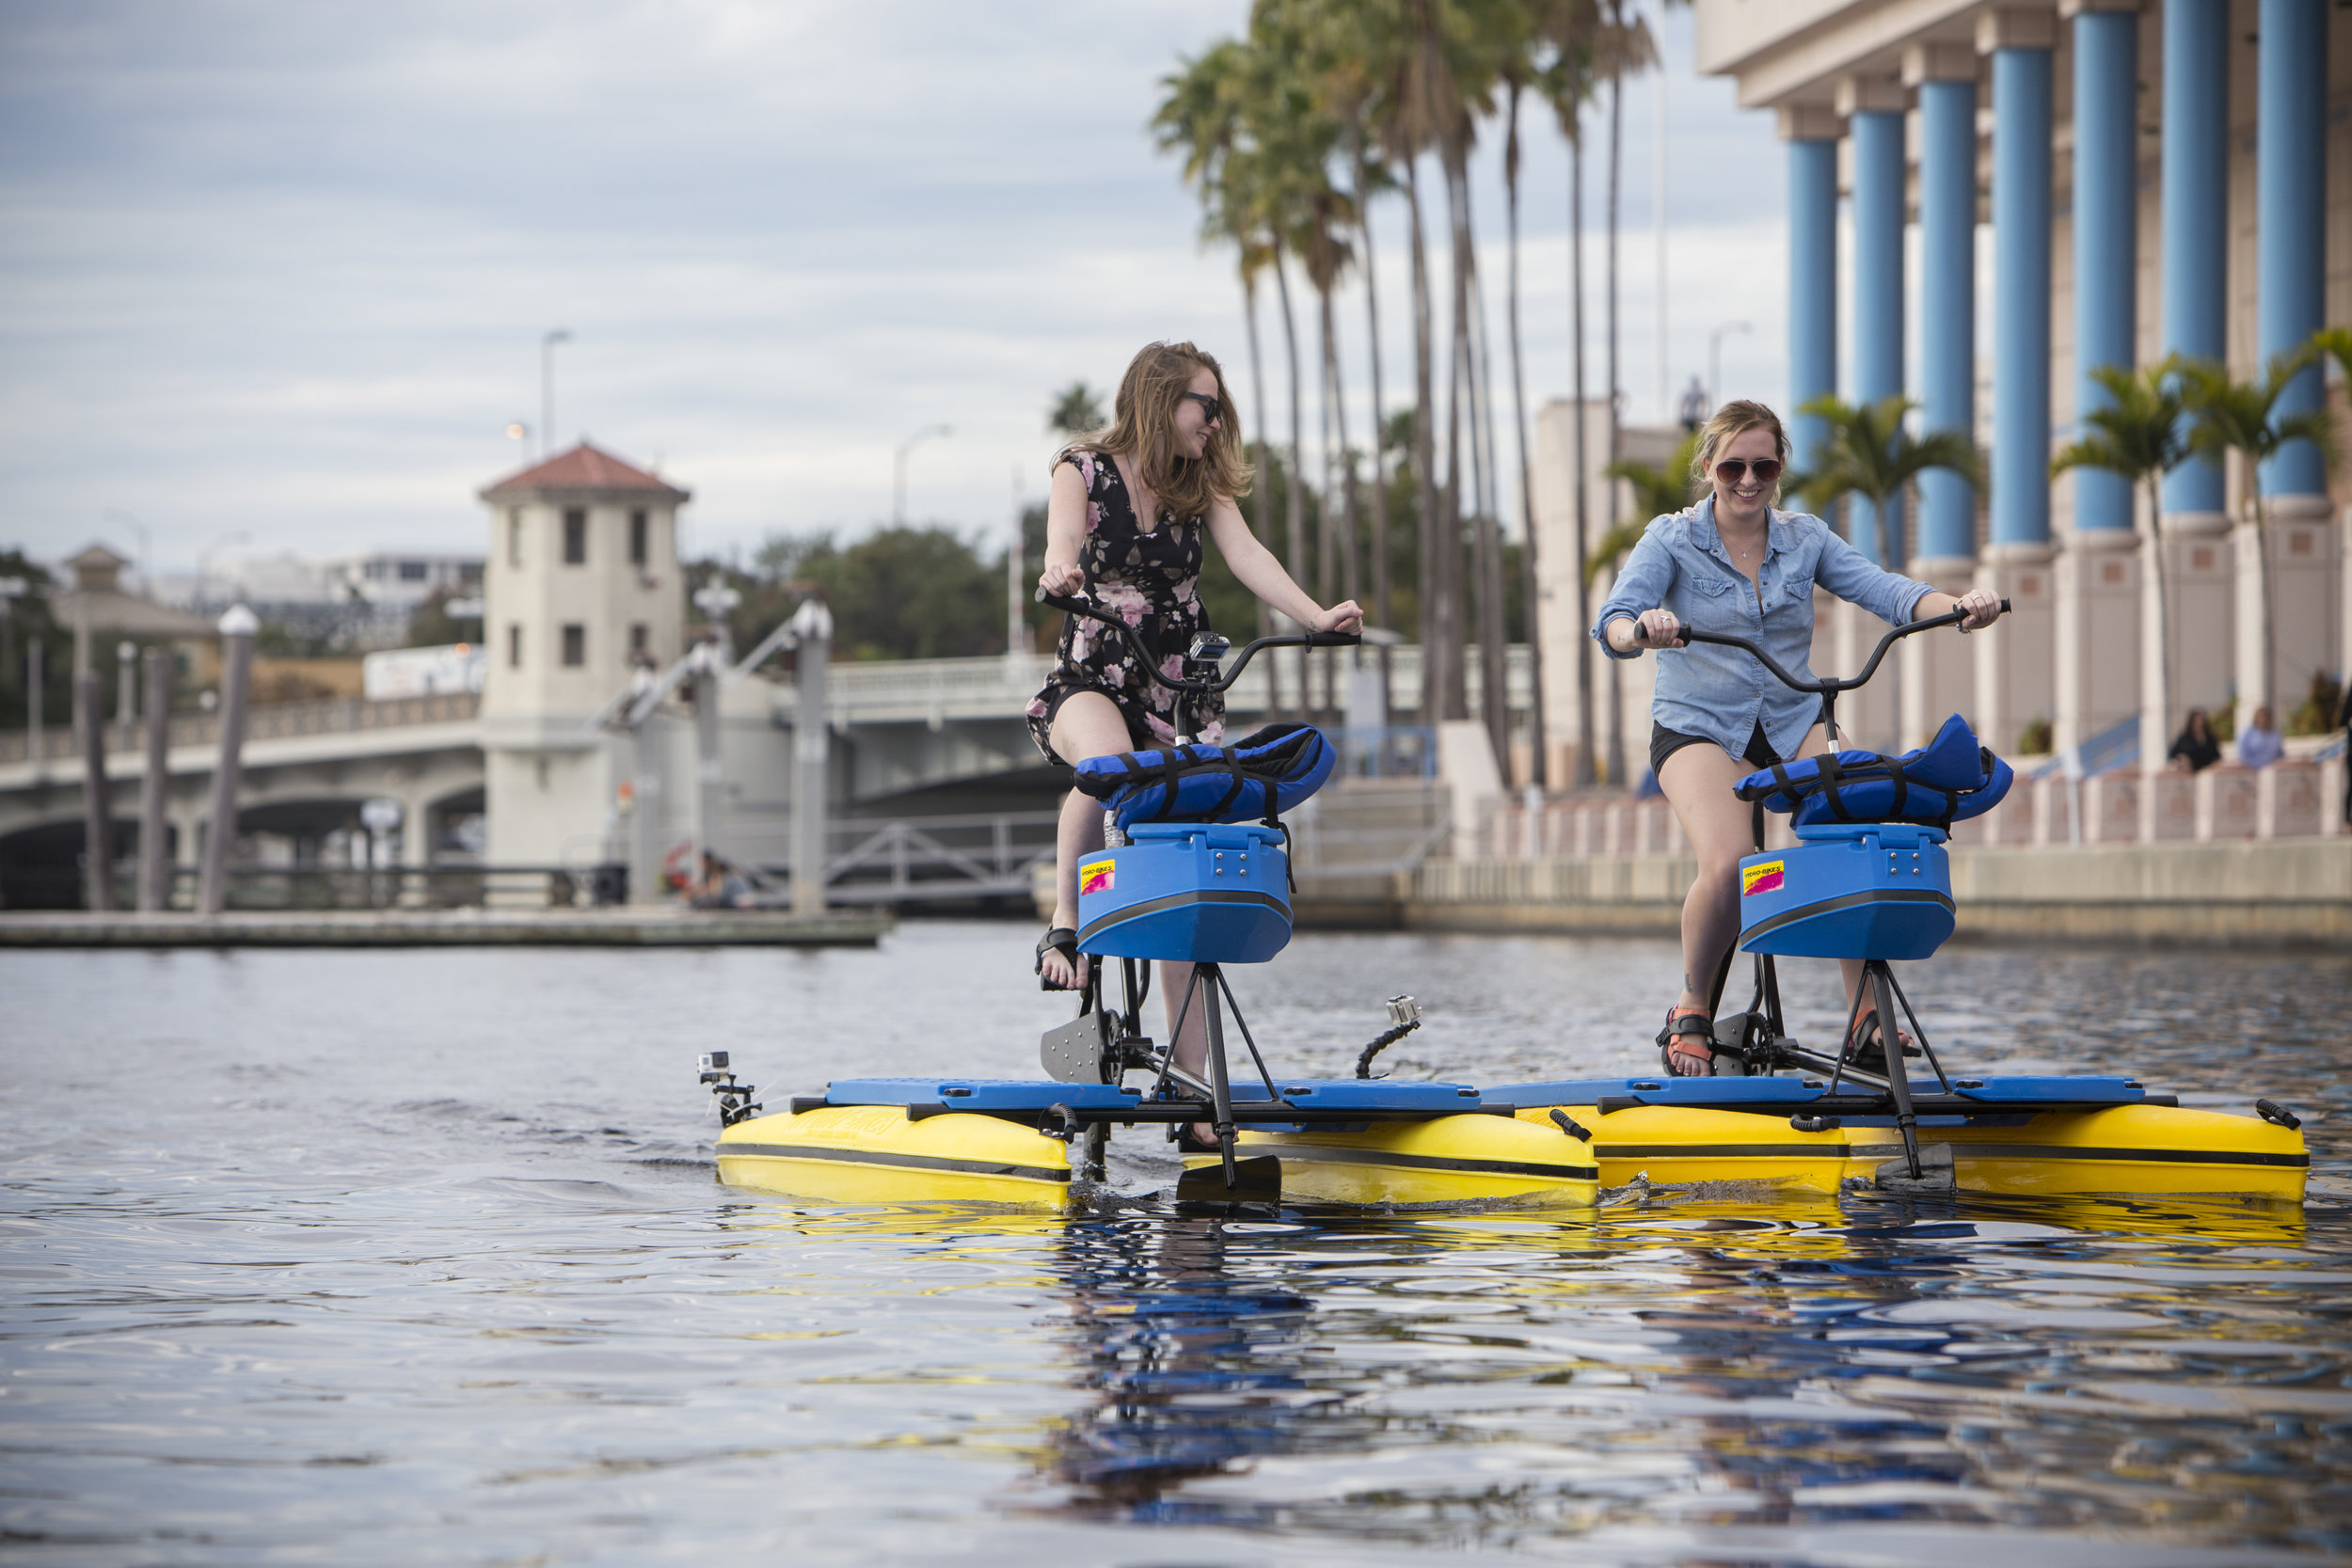 Tampa Water Bike Company date ideas Tampa